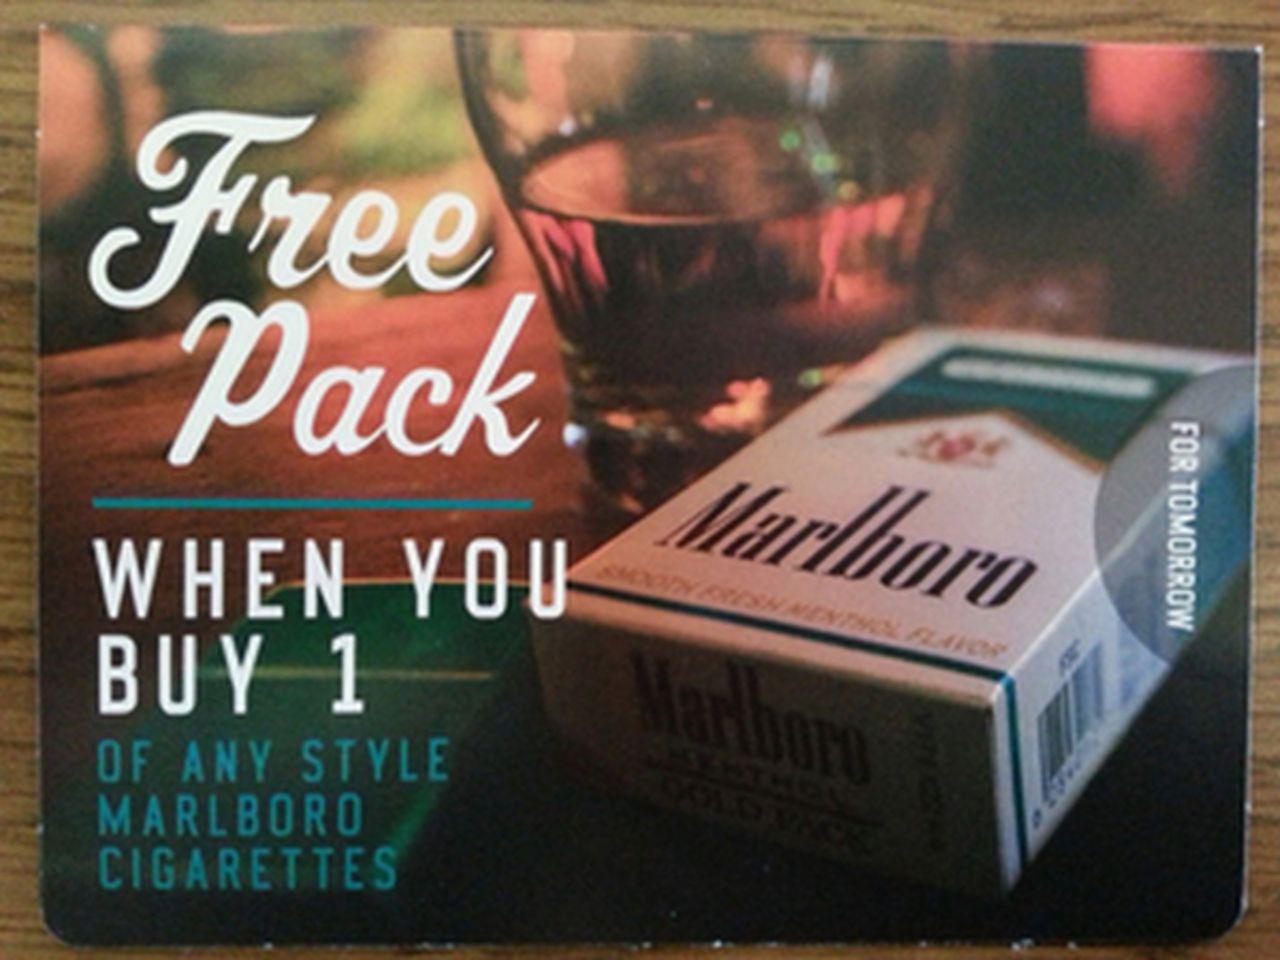 Cost of pack of cigarettes Marlboro in Louisiana 2018